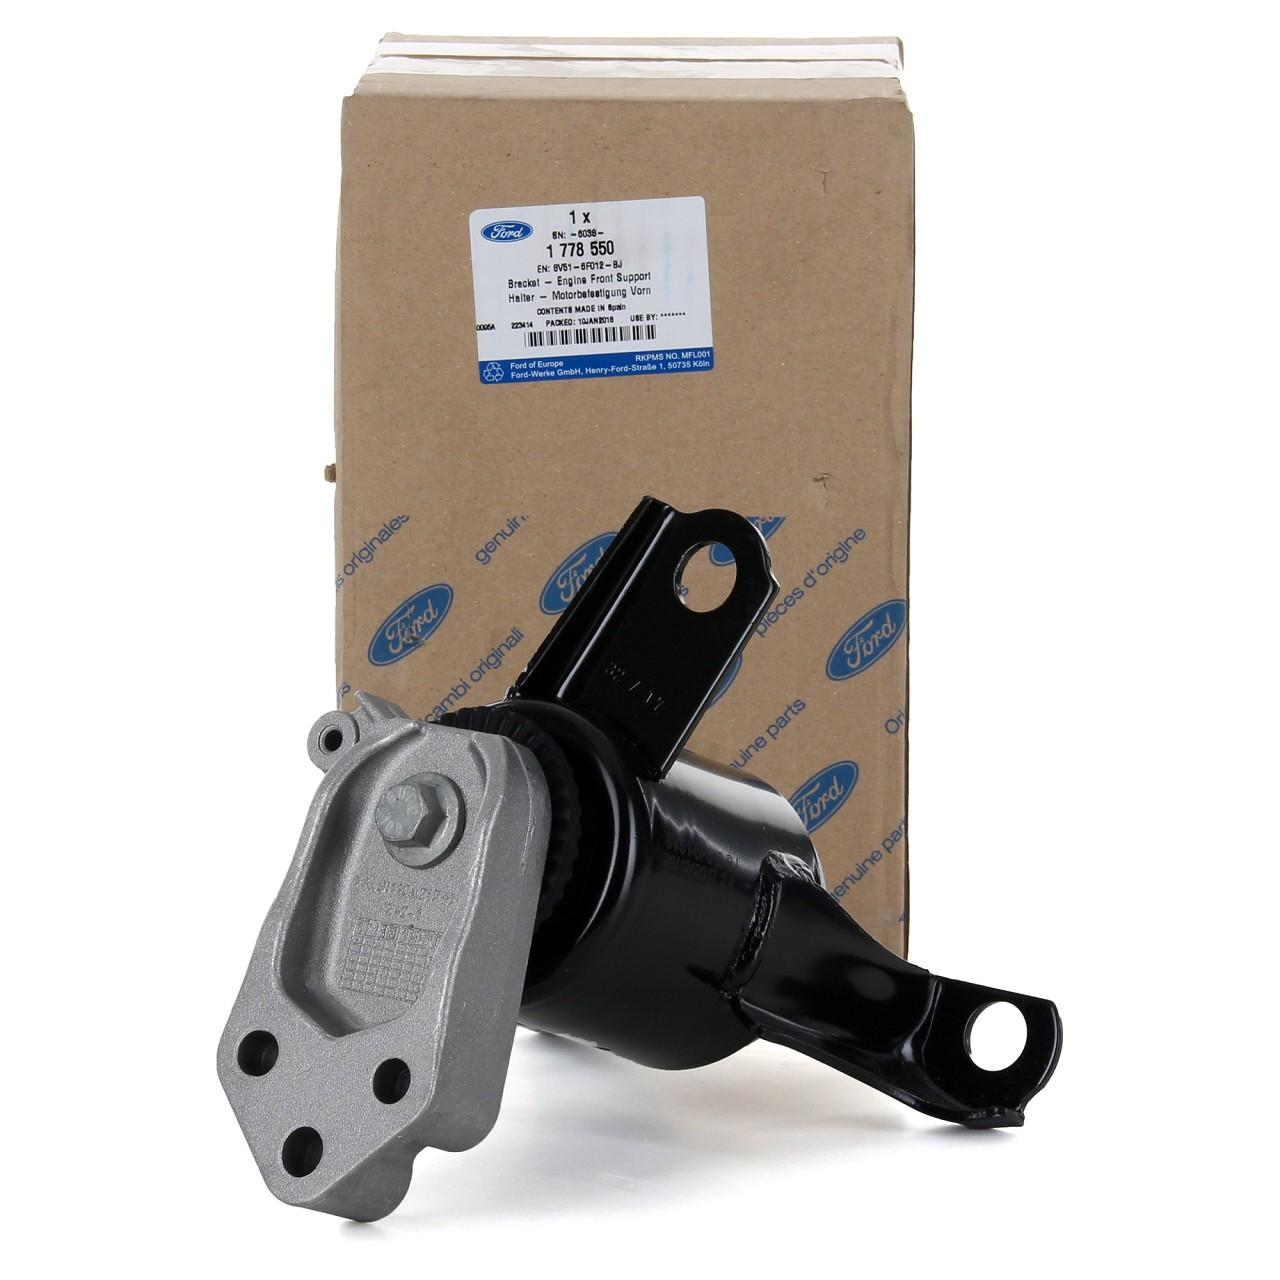 ORIGINAL Ford Motorlager FIESTA VI MK6 1.4TDCi 1.6TDCi 68-95 PS 1778550